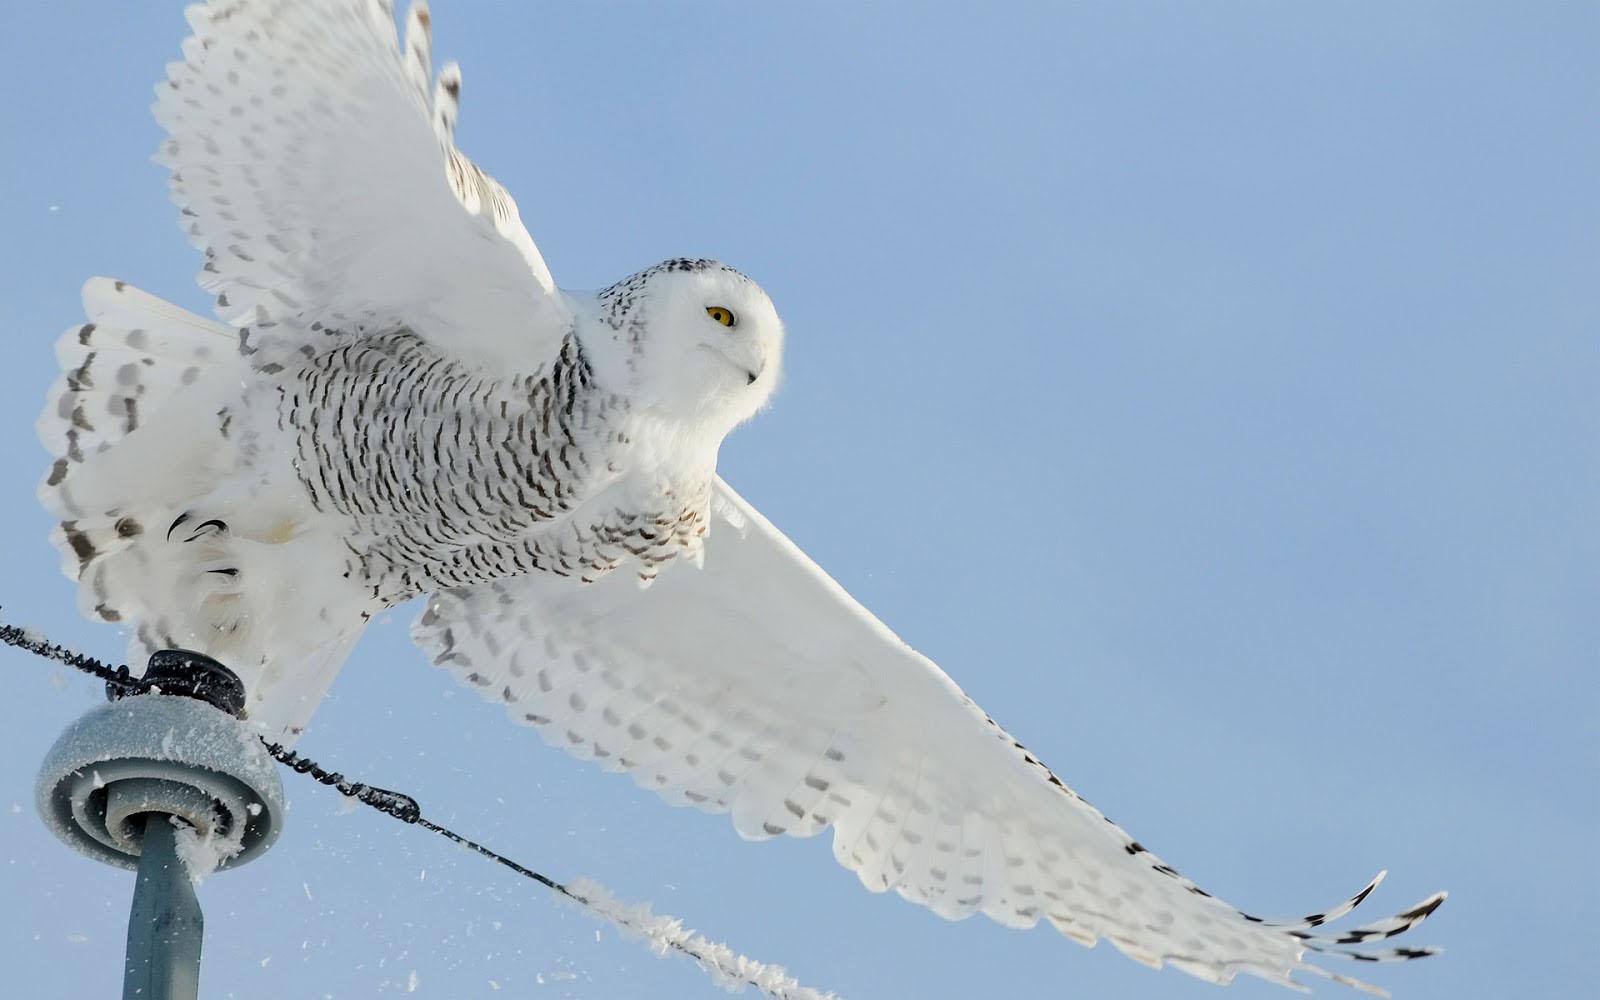 White Owl Wallpaper - WallpaperSafari